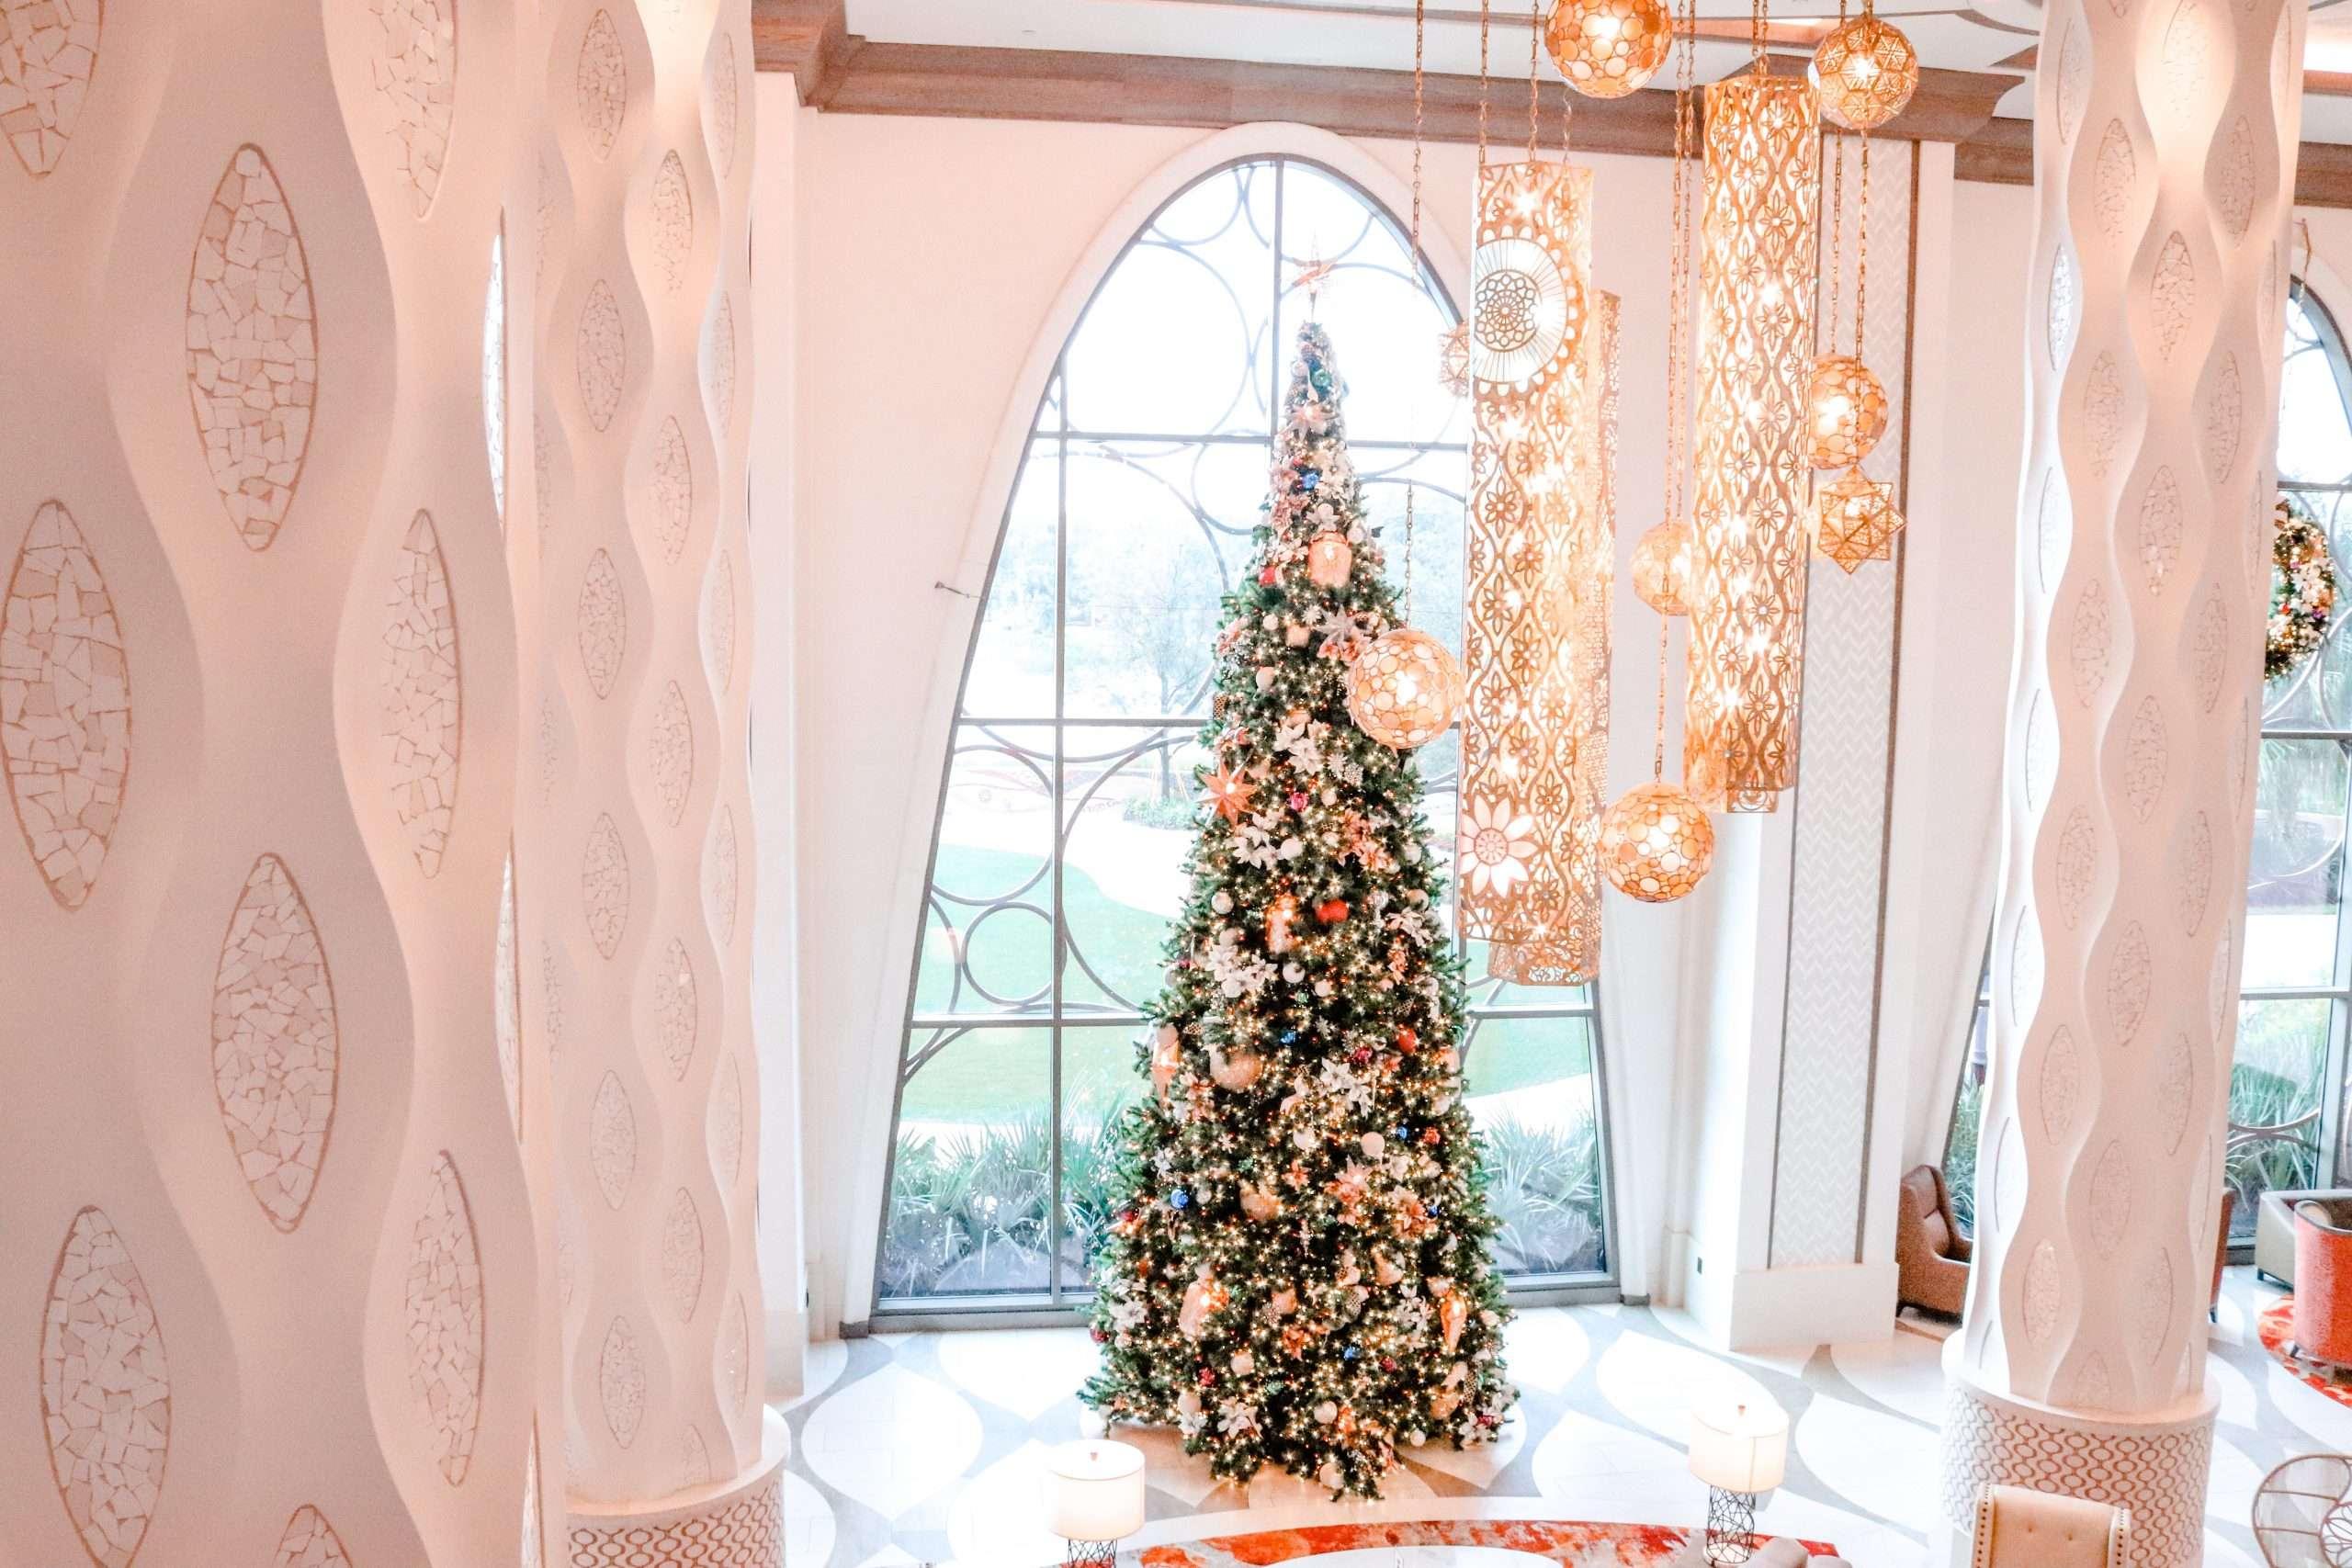 Disney Resort Decorations Holiday Tour at Walt Disney World